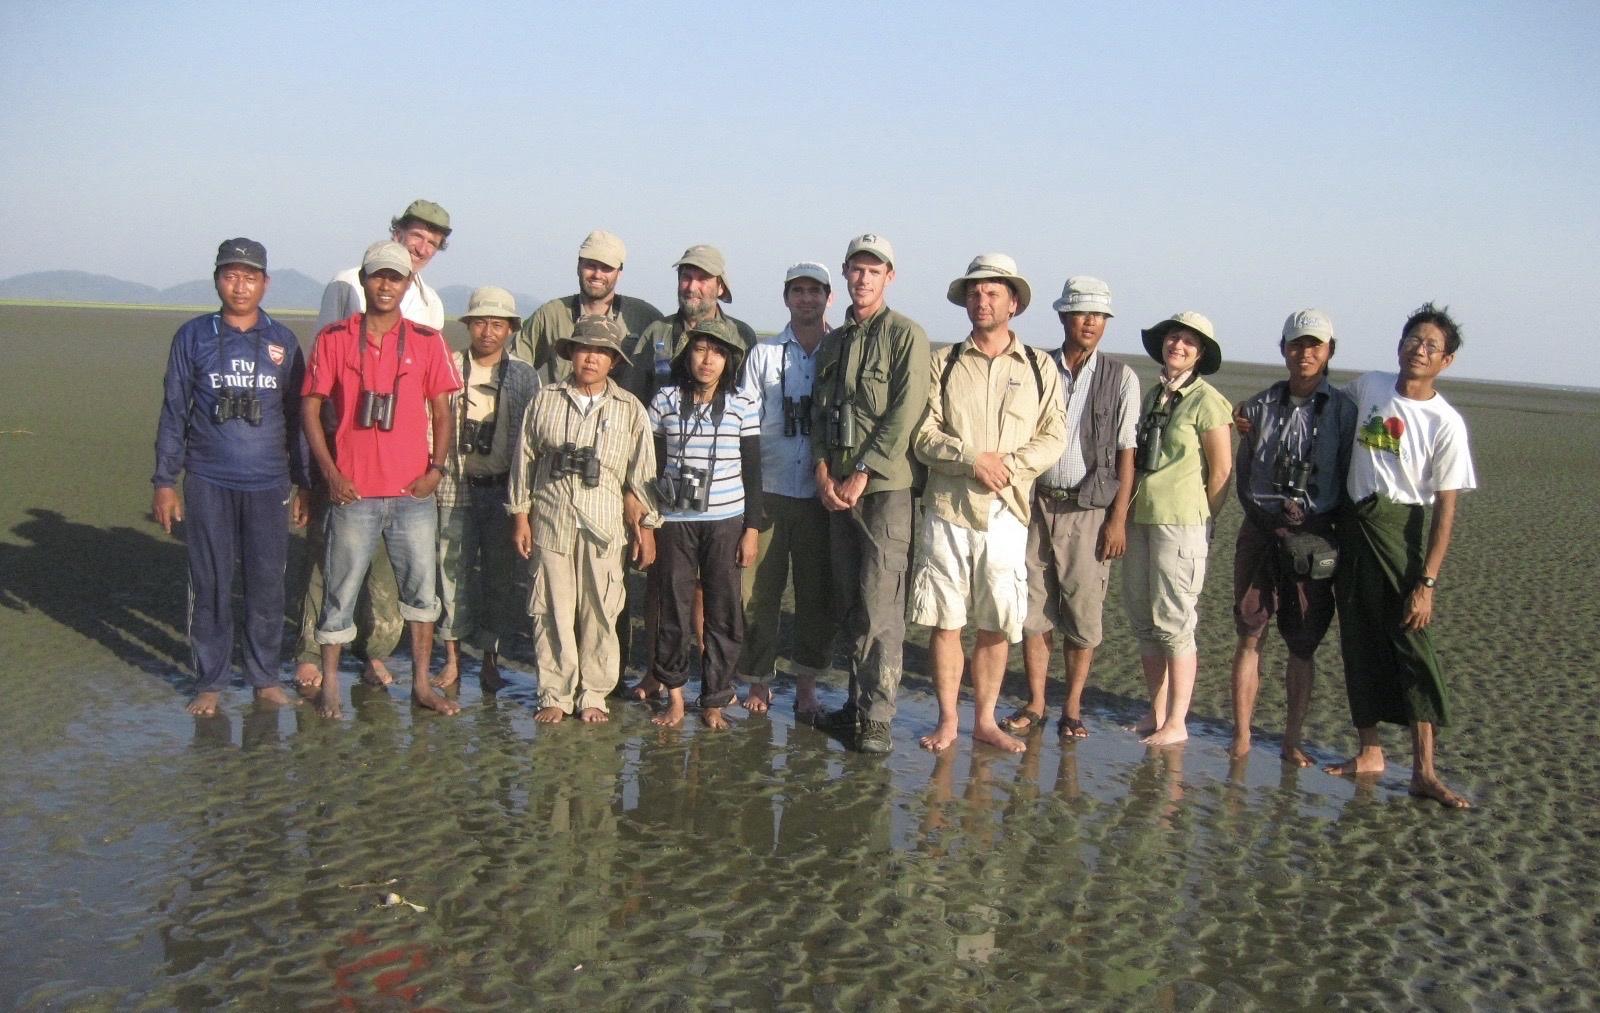 Spoon-billed Sandpiper Surveyors, Gulf of Martaban (2010). Photo credit: Graham Chisholm